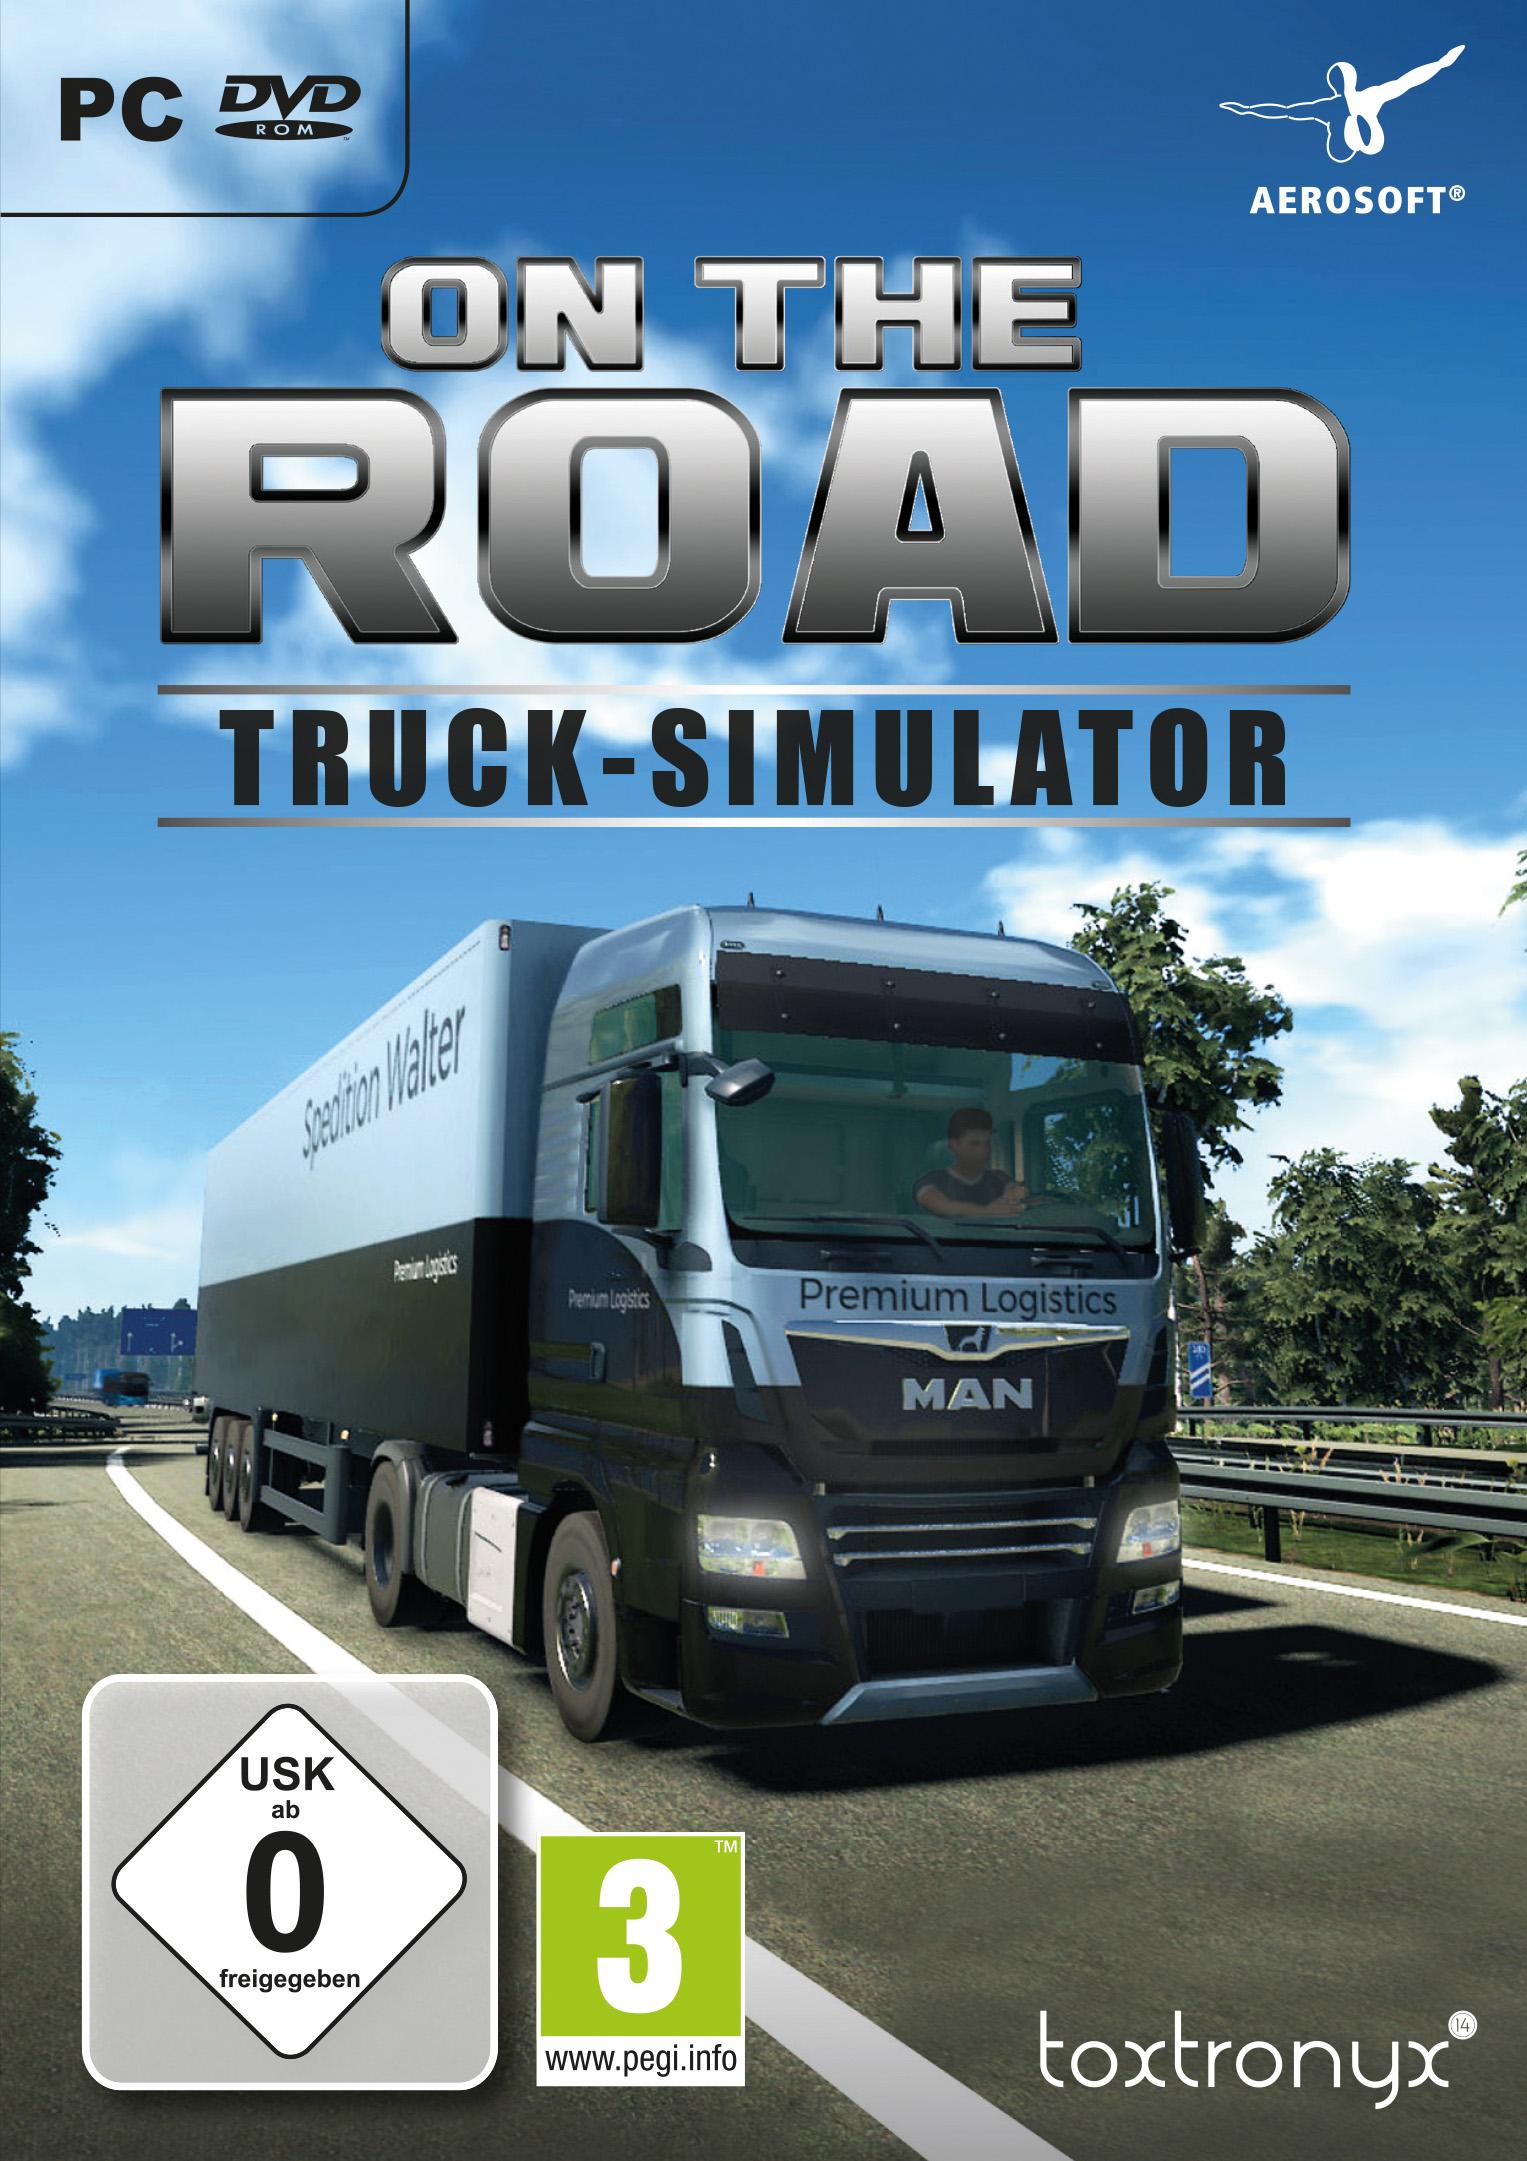 Truck Simulator - On the Road (Truck / LKW - Simulator